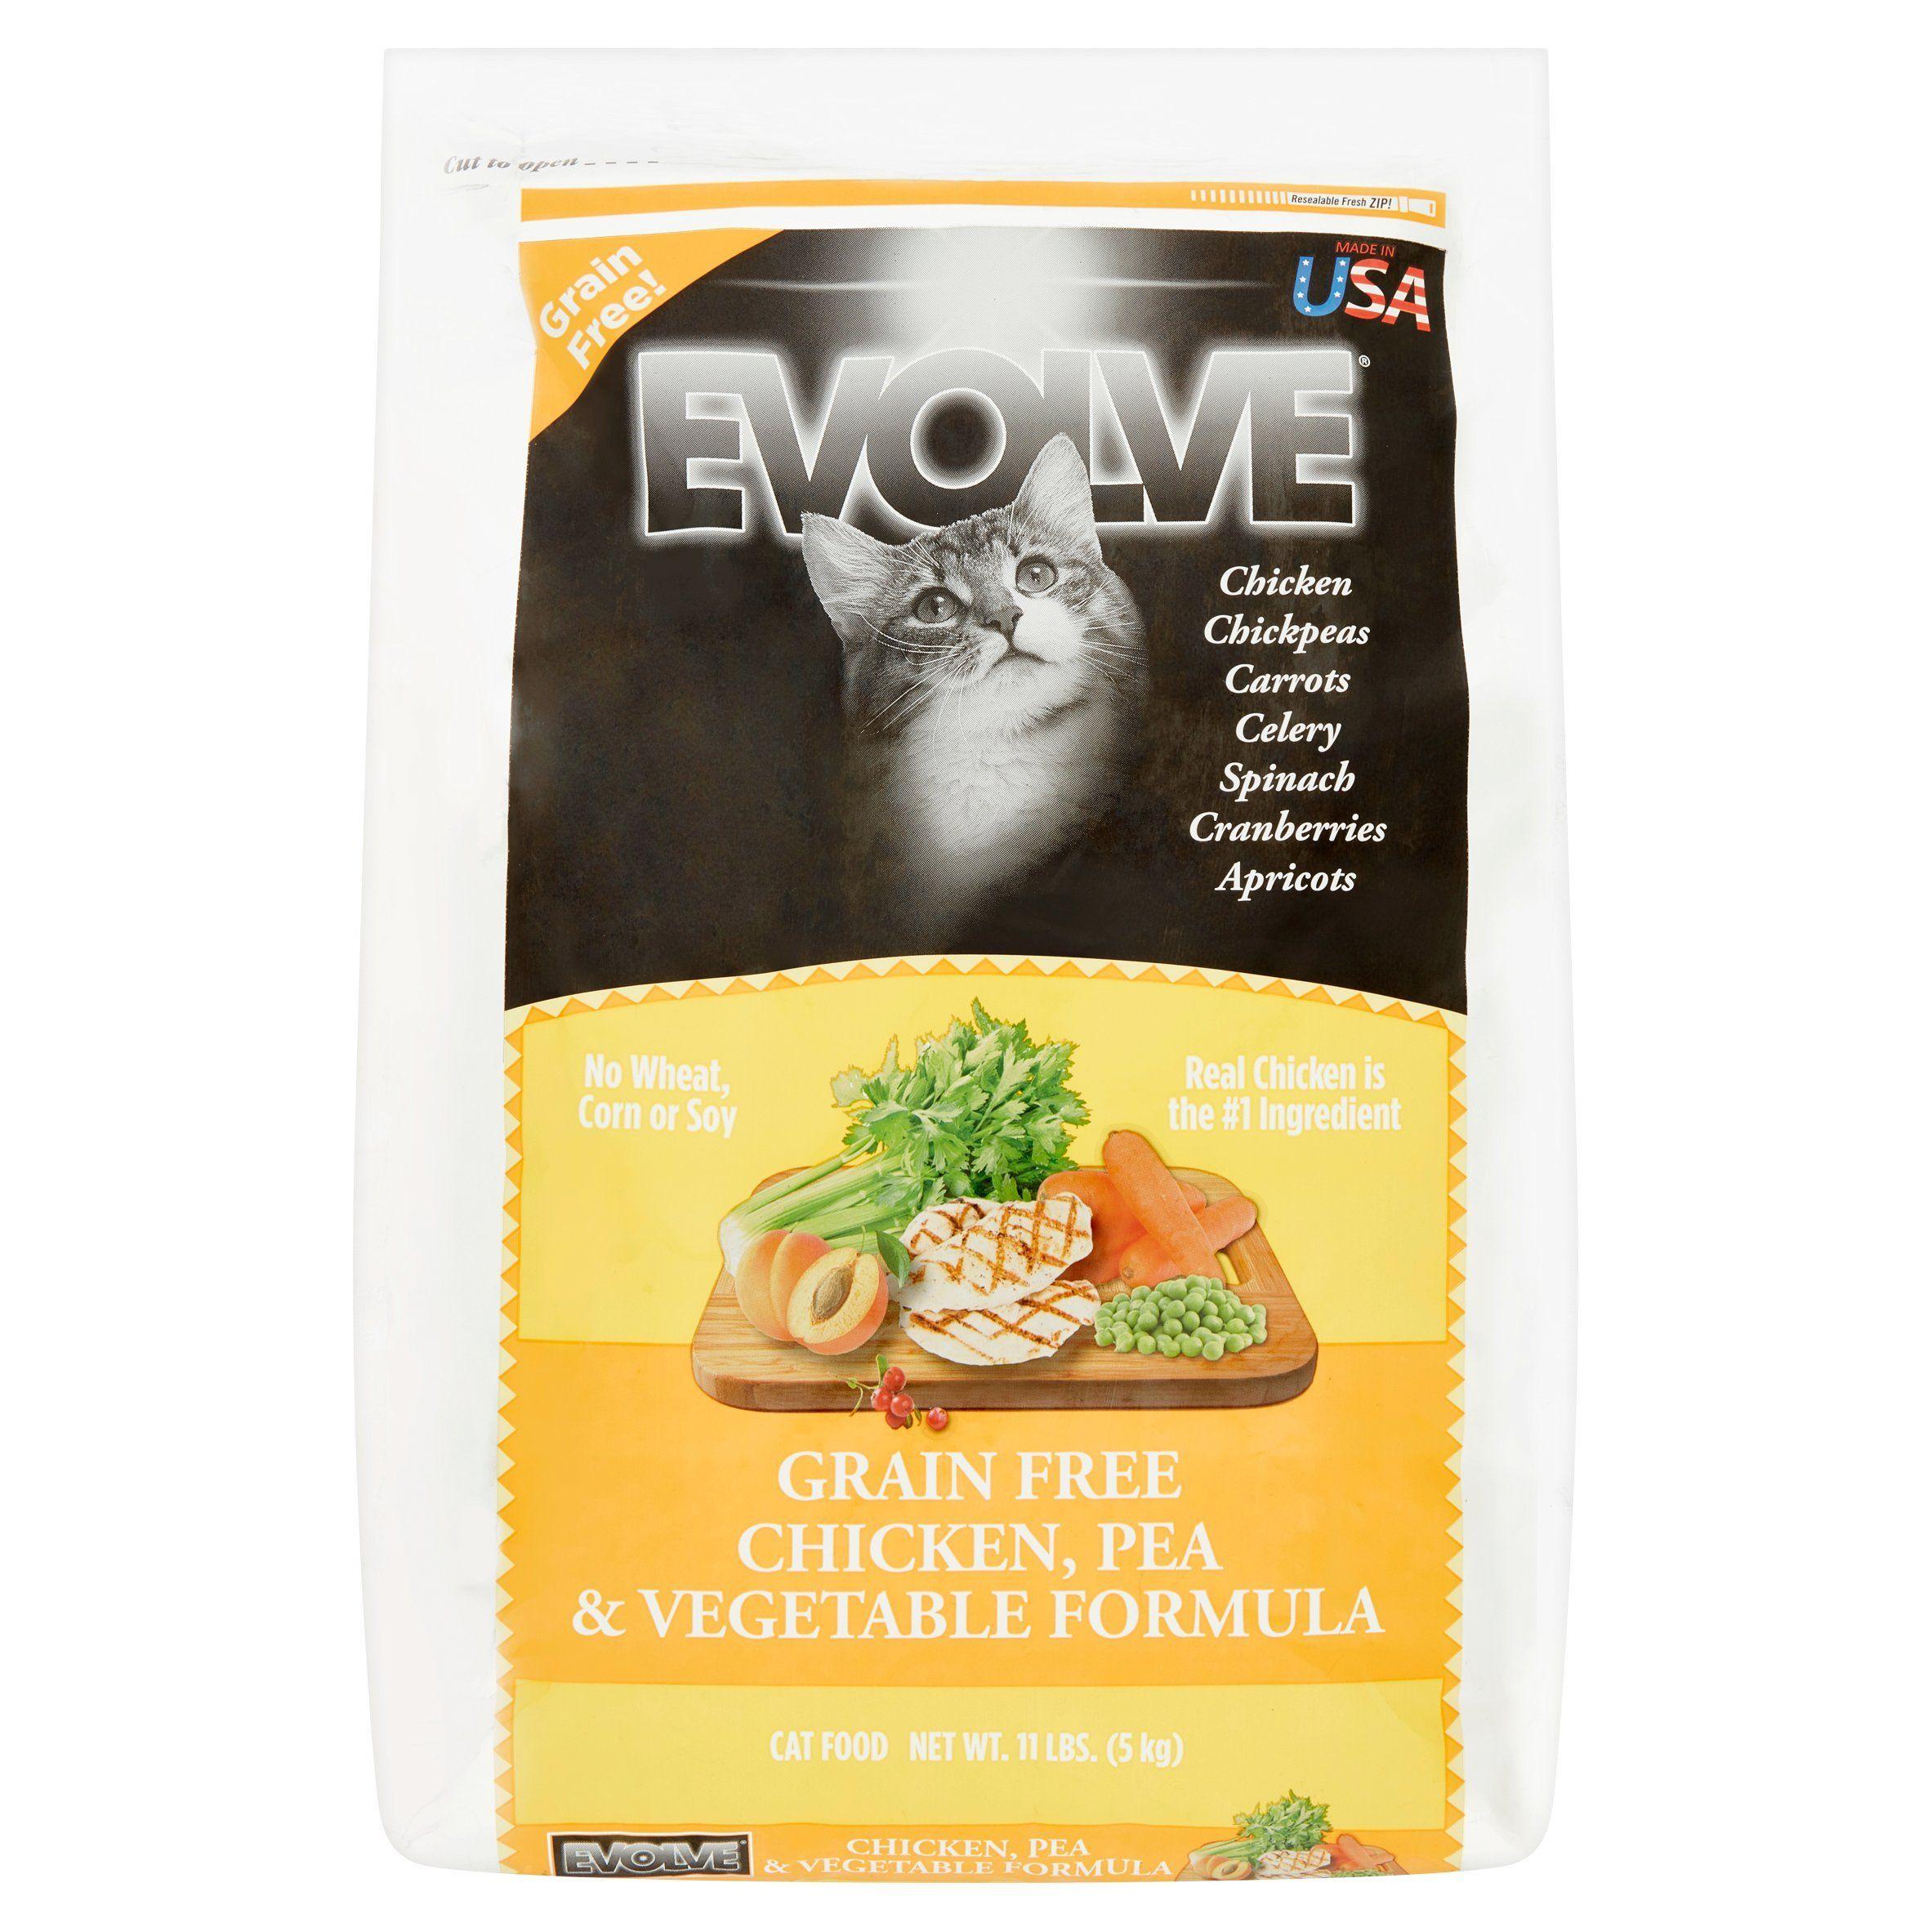 Evolve Grain Free Deboned Chicken Pea and Vegetable